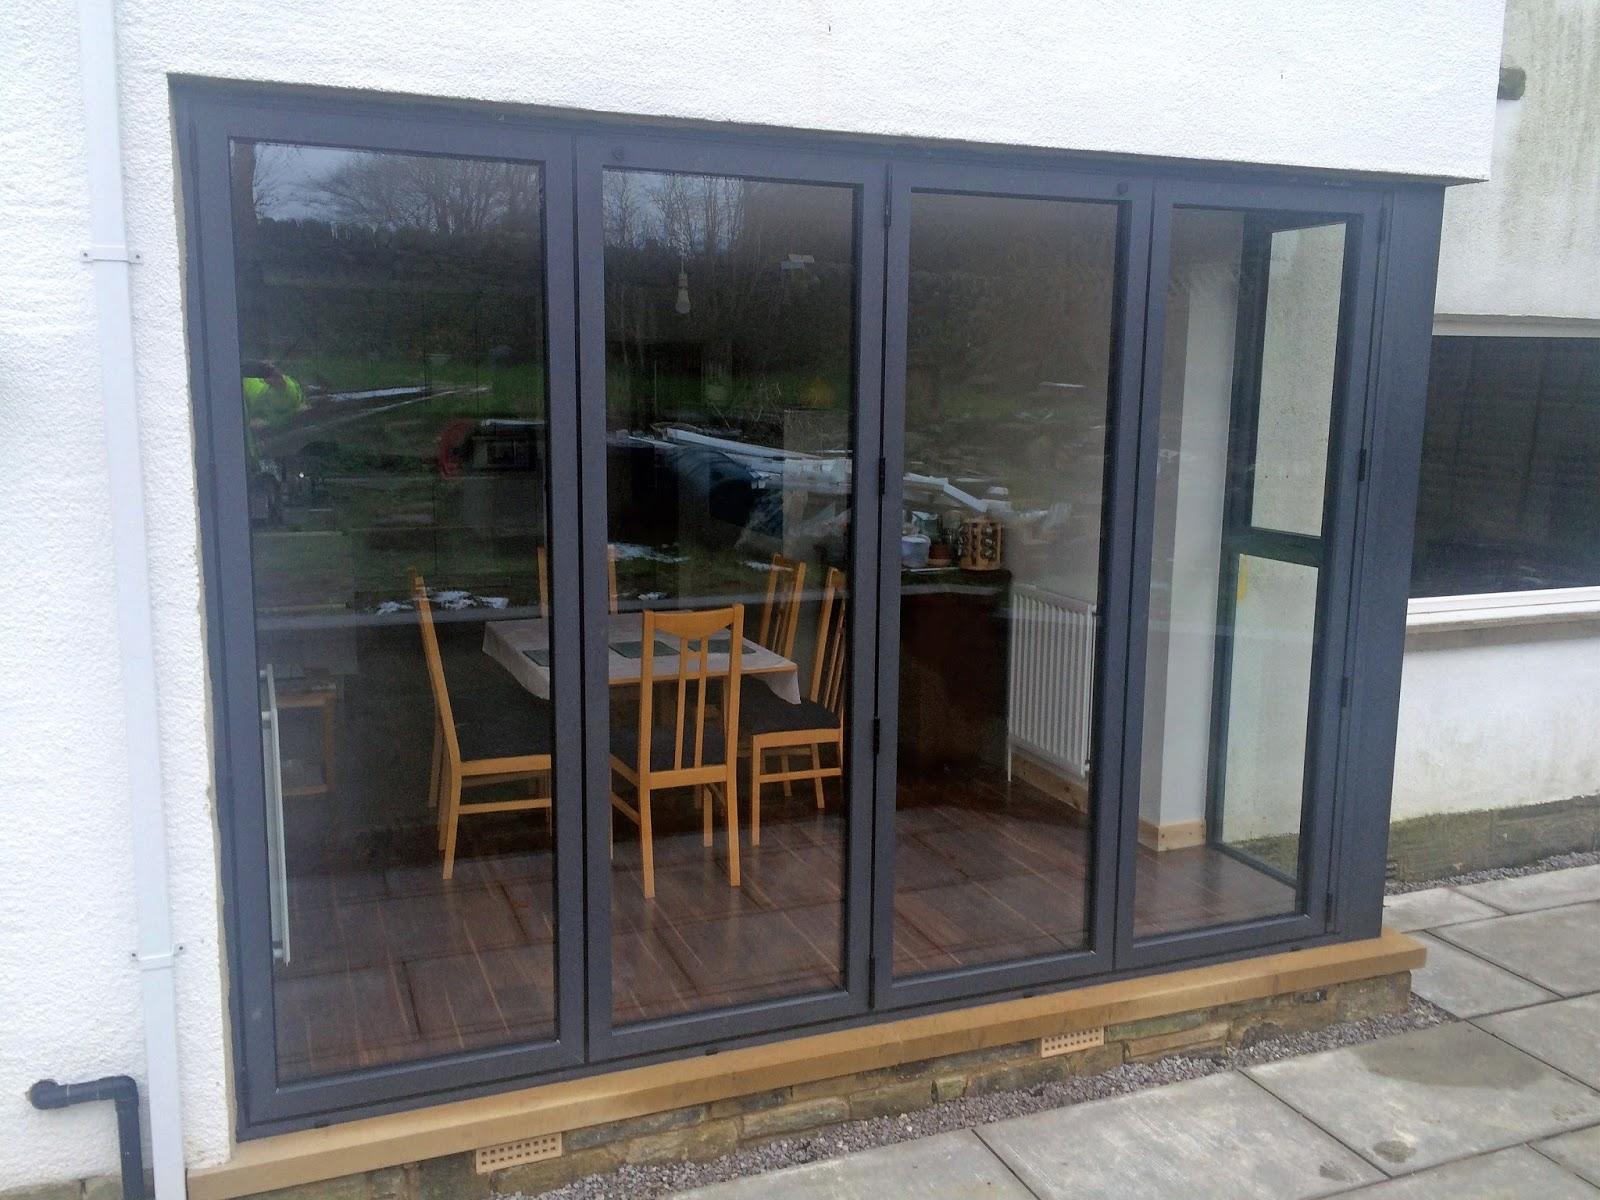 Marlin Windows Visofold 1000 Bi Fold Doors Alitherm 800